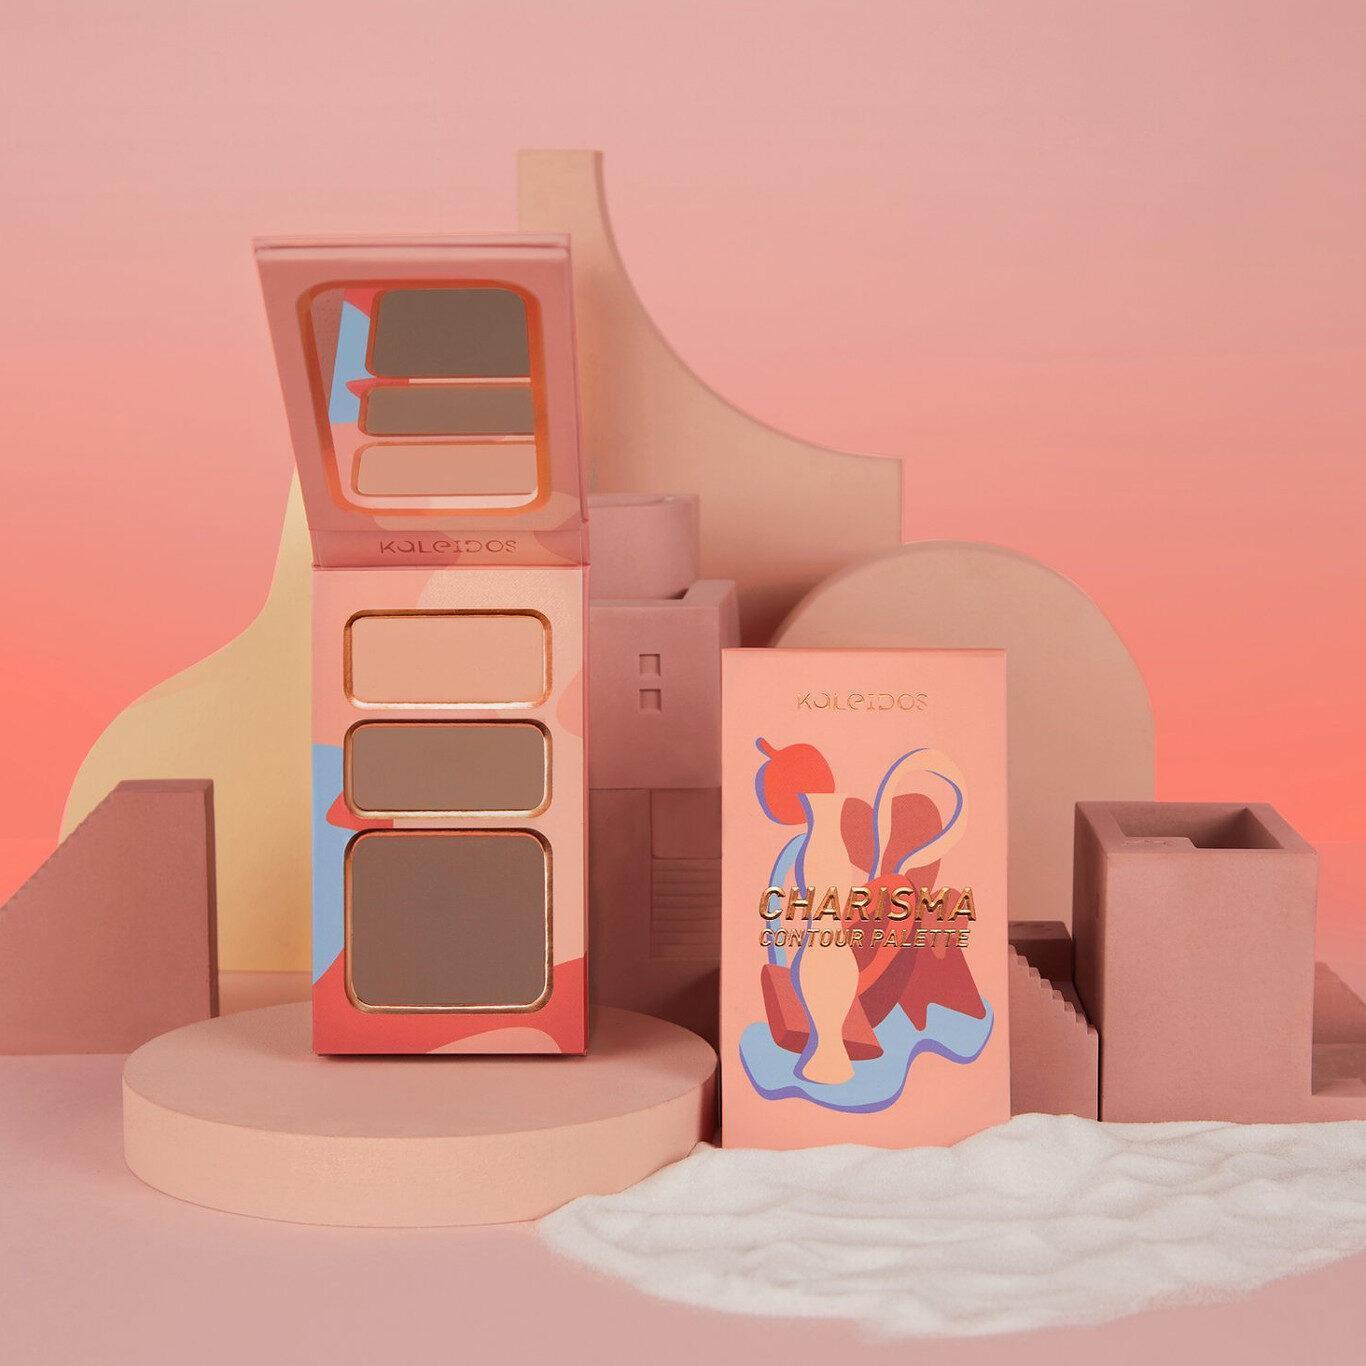 Kaleidos Makeup The Fresh Fantasy Collection Charisma Contour Cool and Light Promo